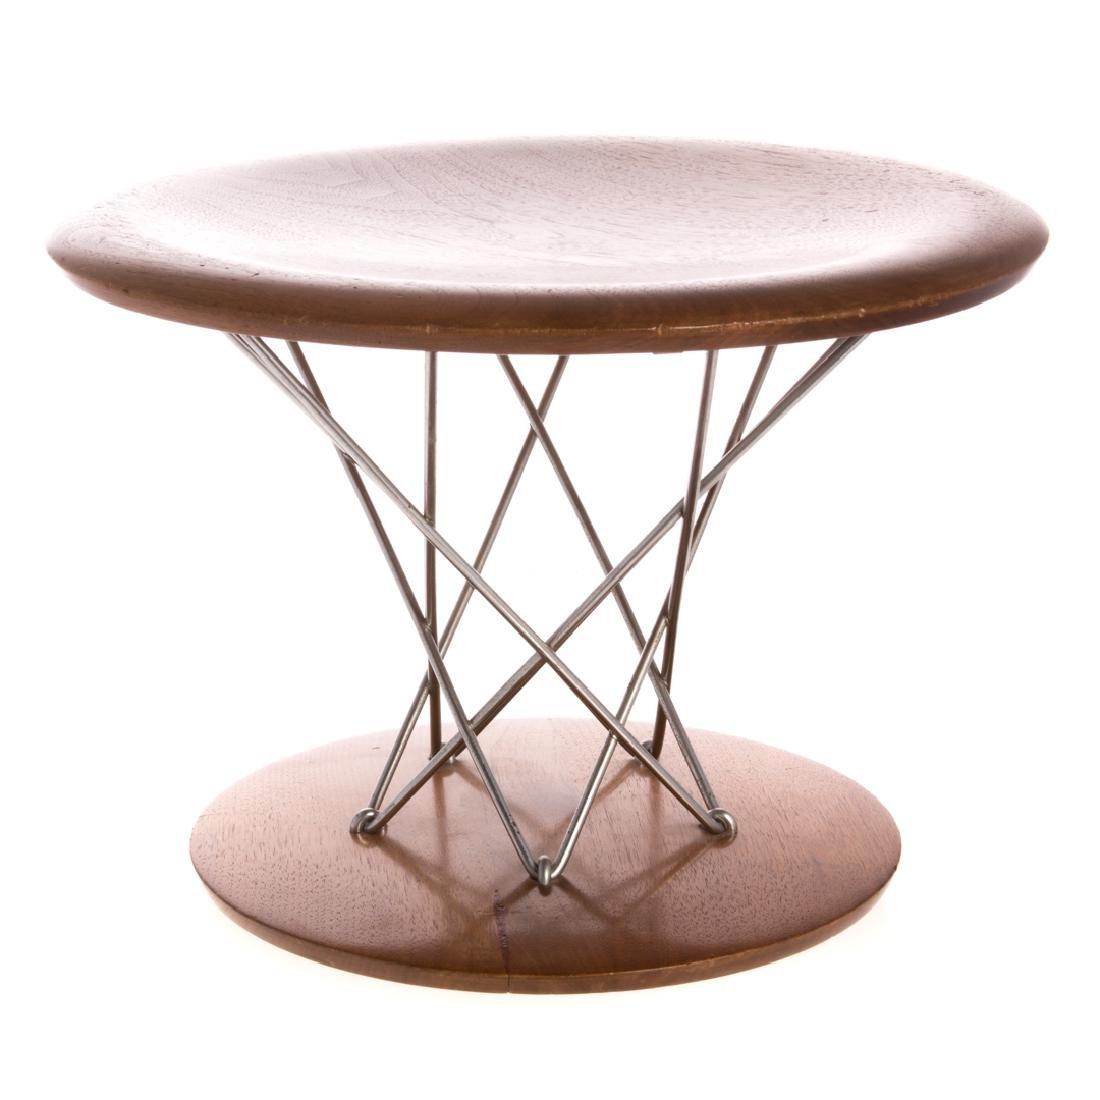 Isamu Noguchi walnut rocking stool by Knoll